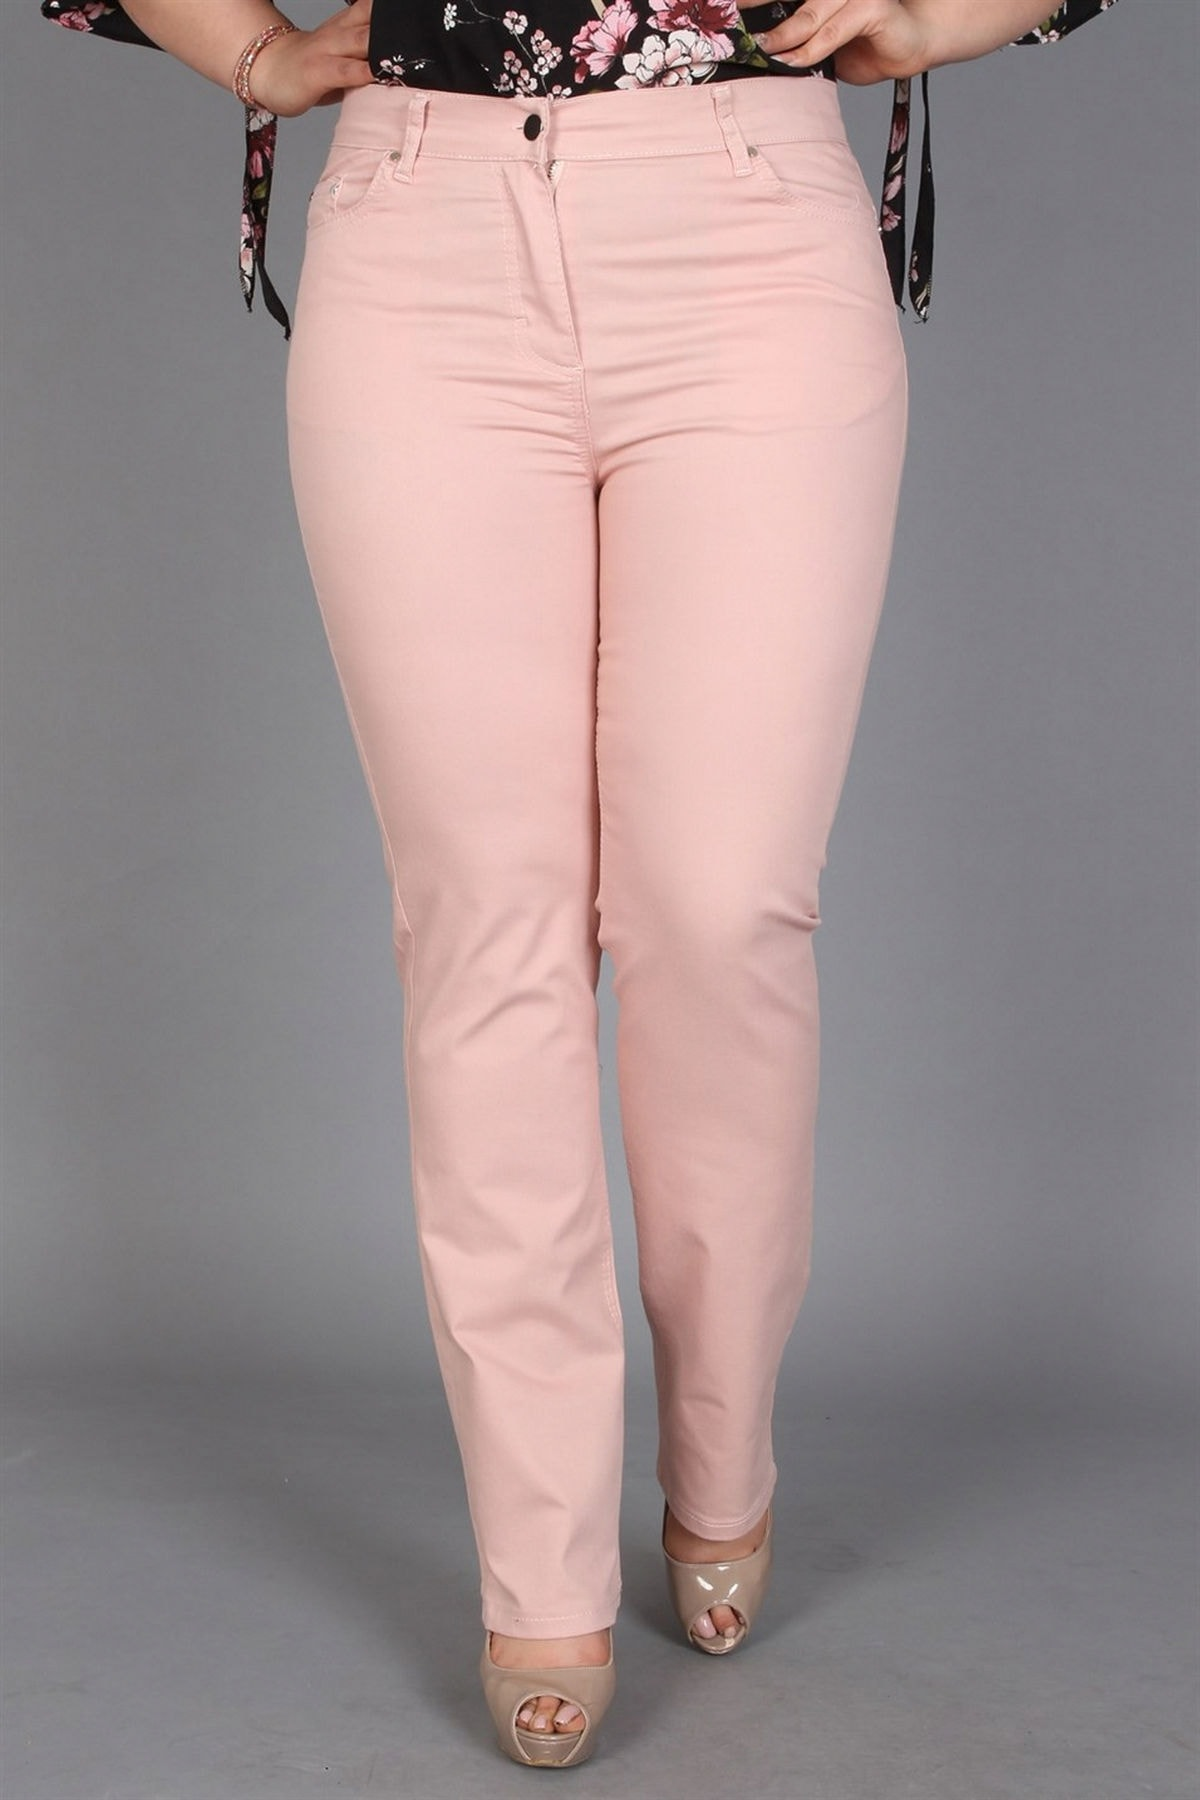 Günay Giyim Kadın Pudra Kanvas Yüksek Bel Düz Paça Pantolon Rg1029p 1